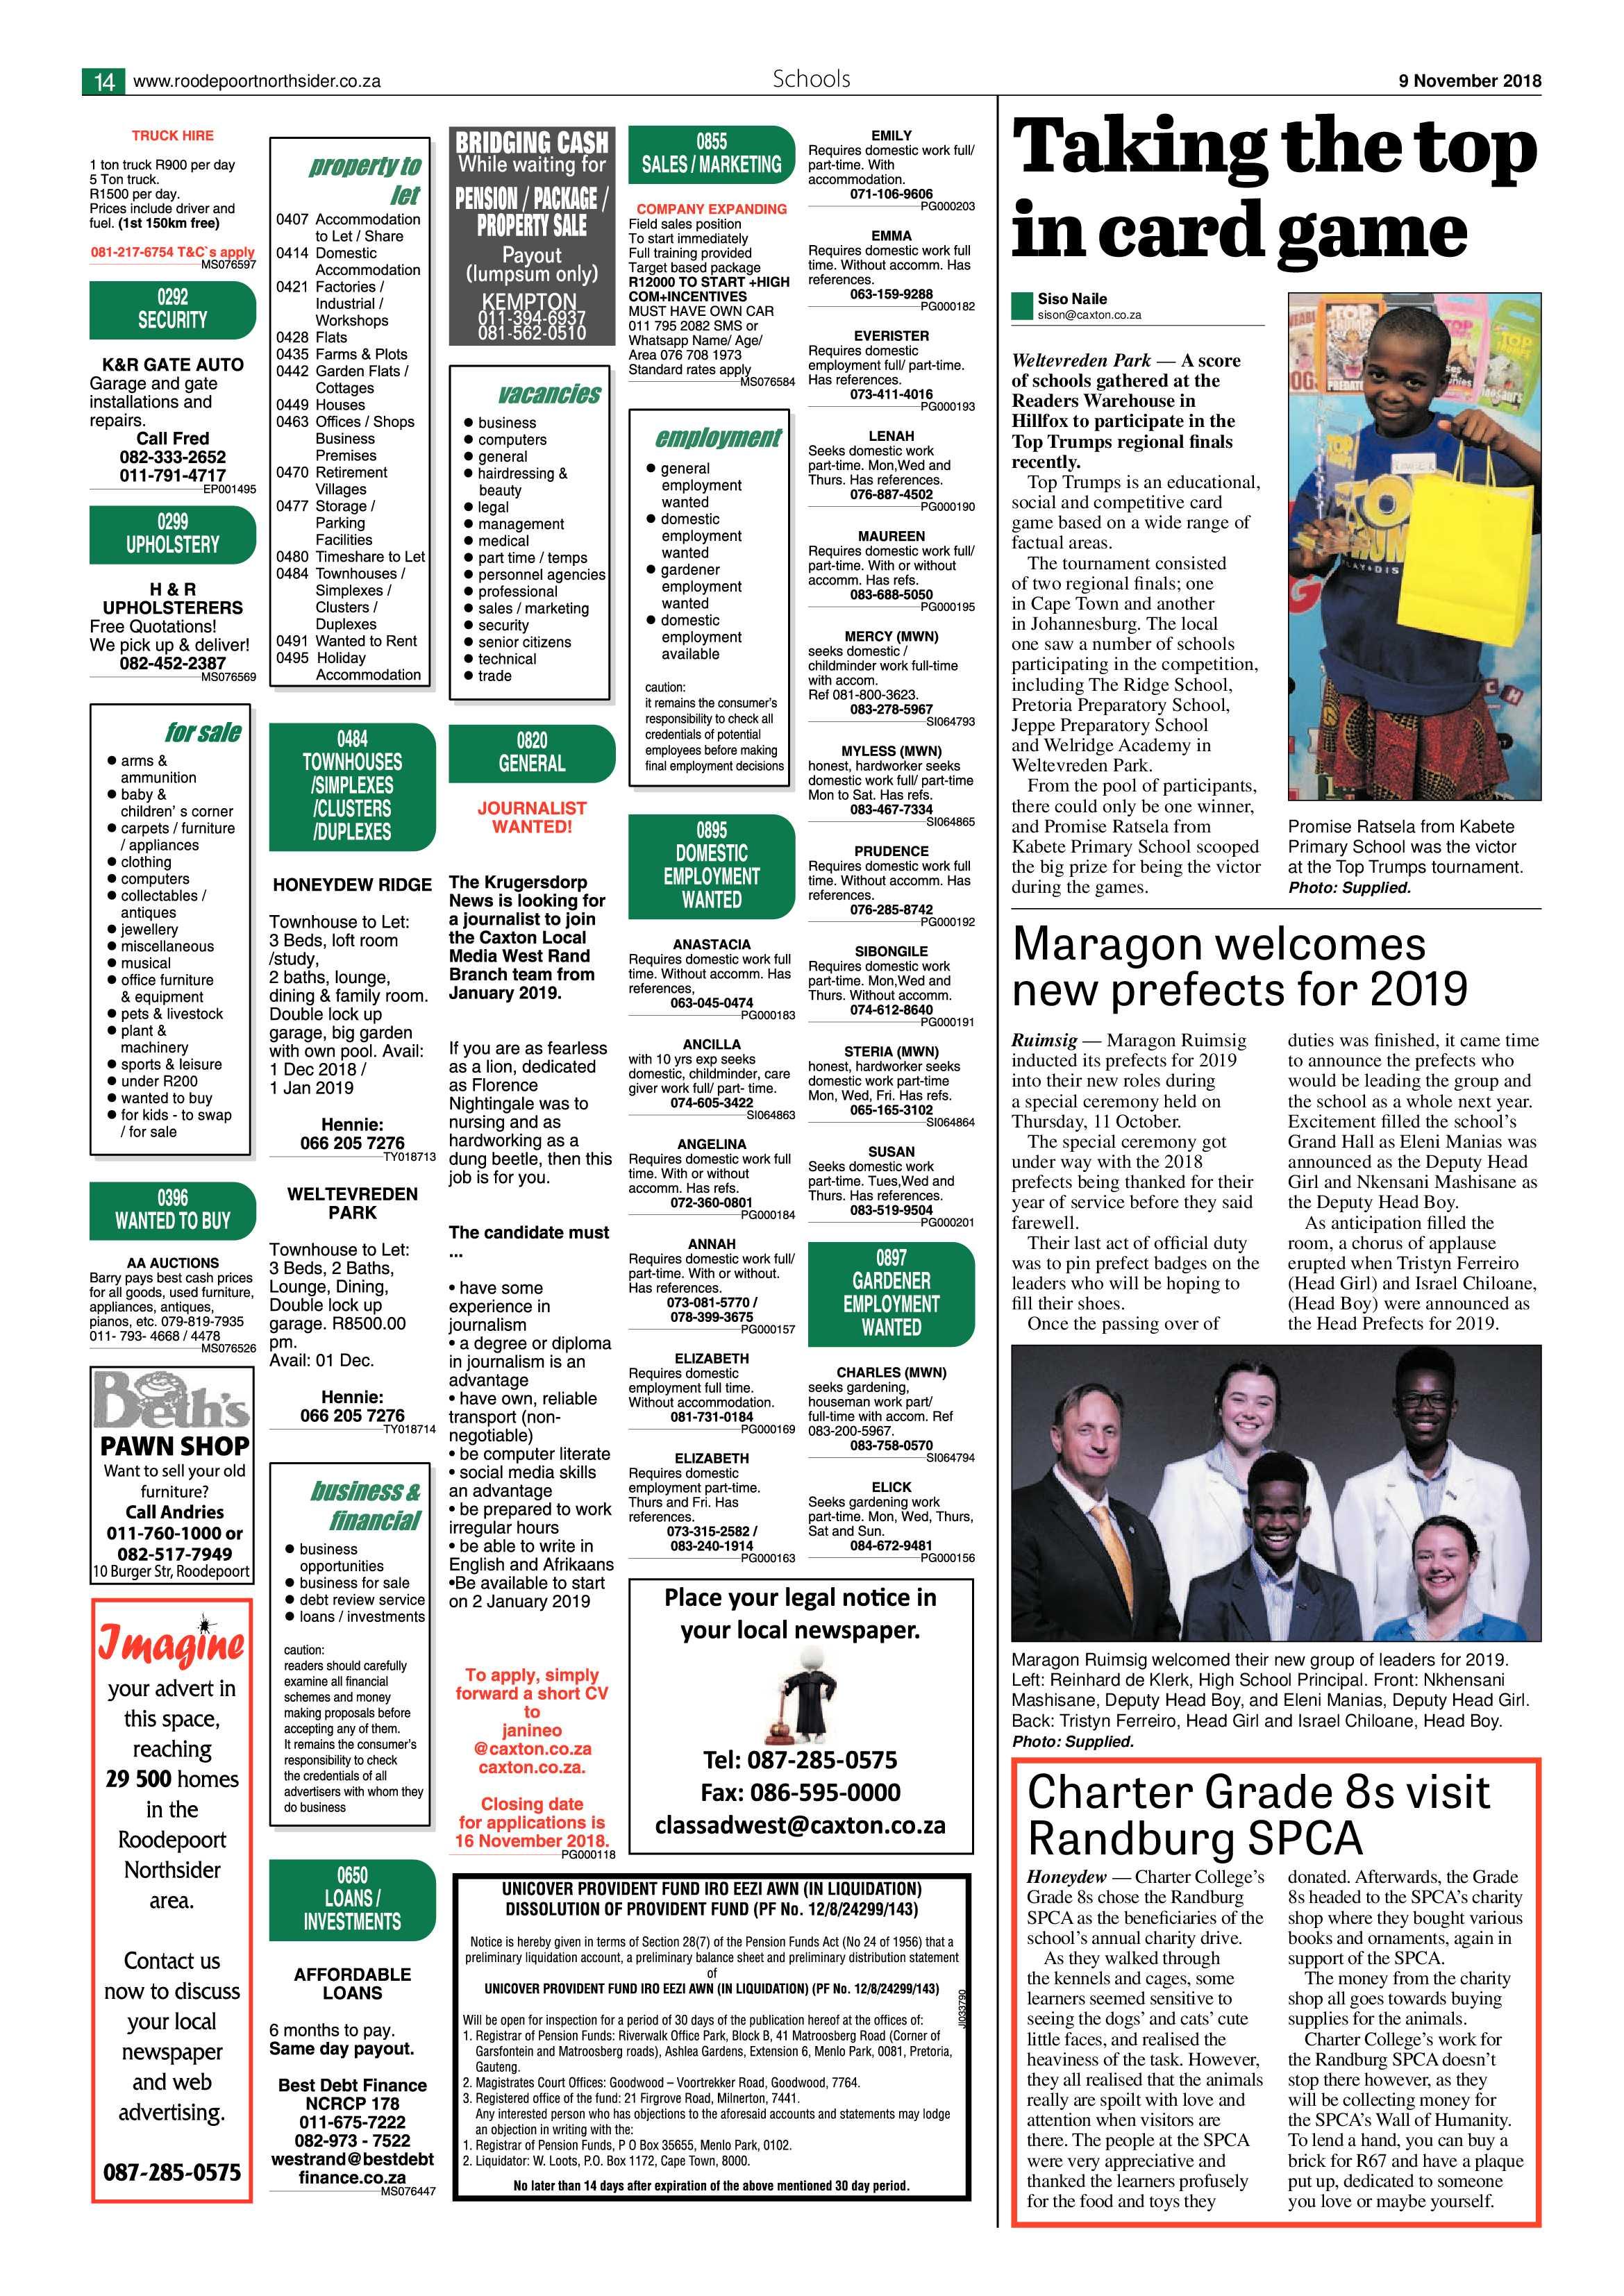 roodepoort-northsider-9-november-2018-epapers-page-14